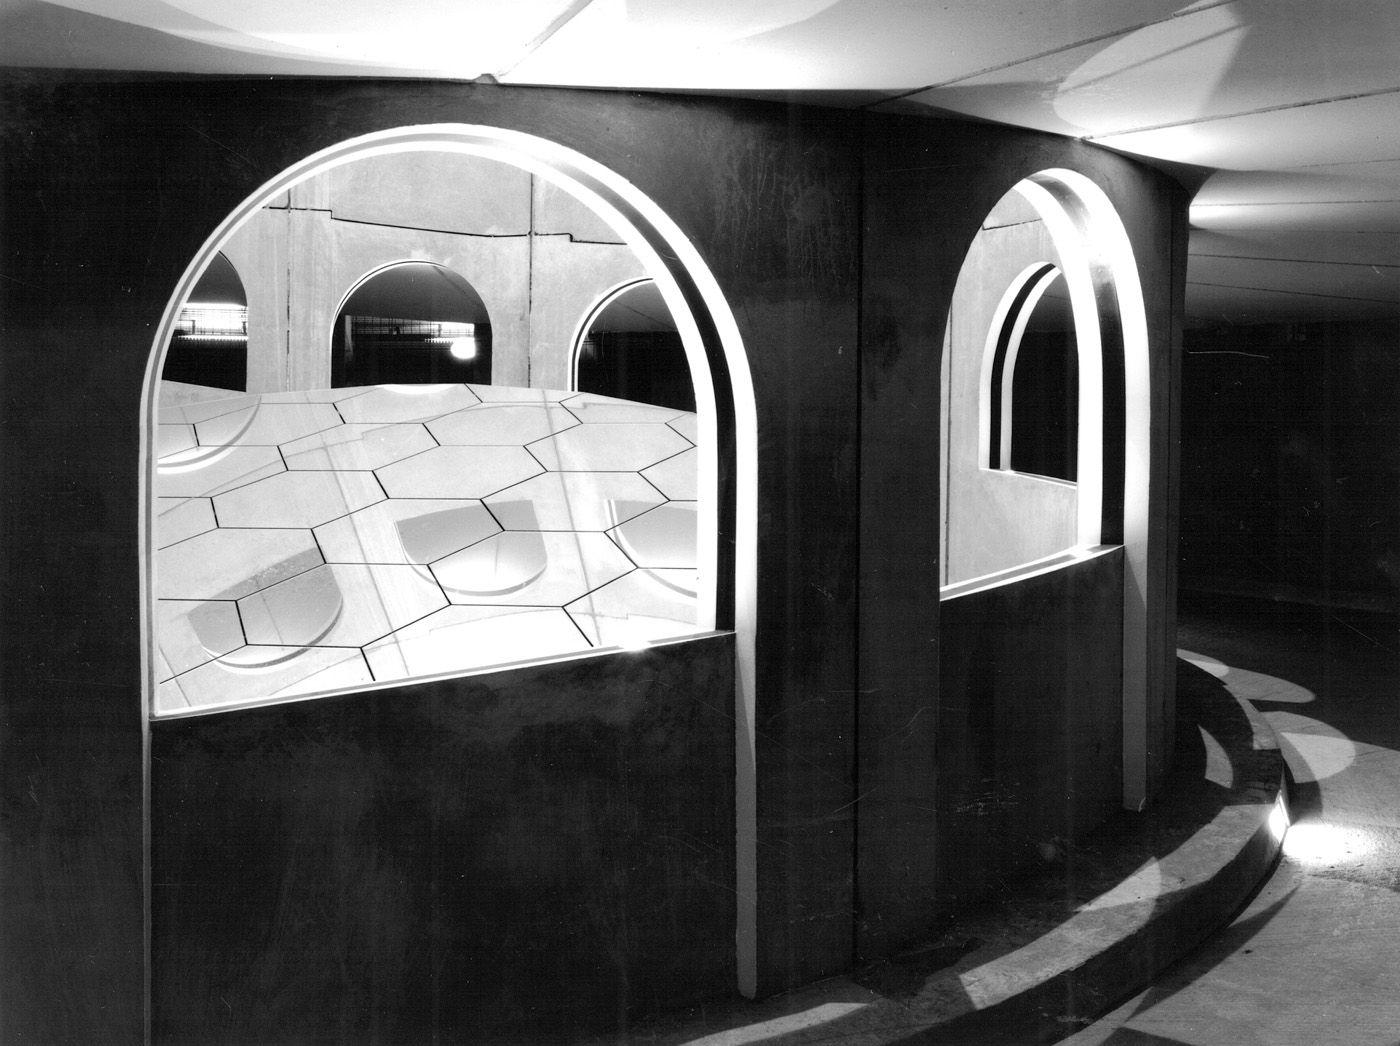 parc des celestins lyons france wilmotte associ s s a lyon france lyon lyon france. Black Bedroom Furniture Sets. Home Design Ideas